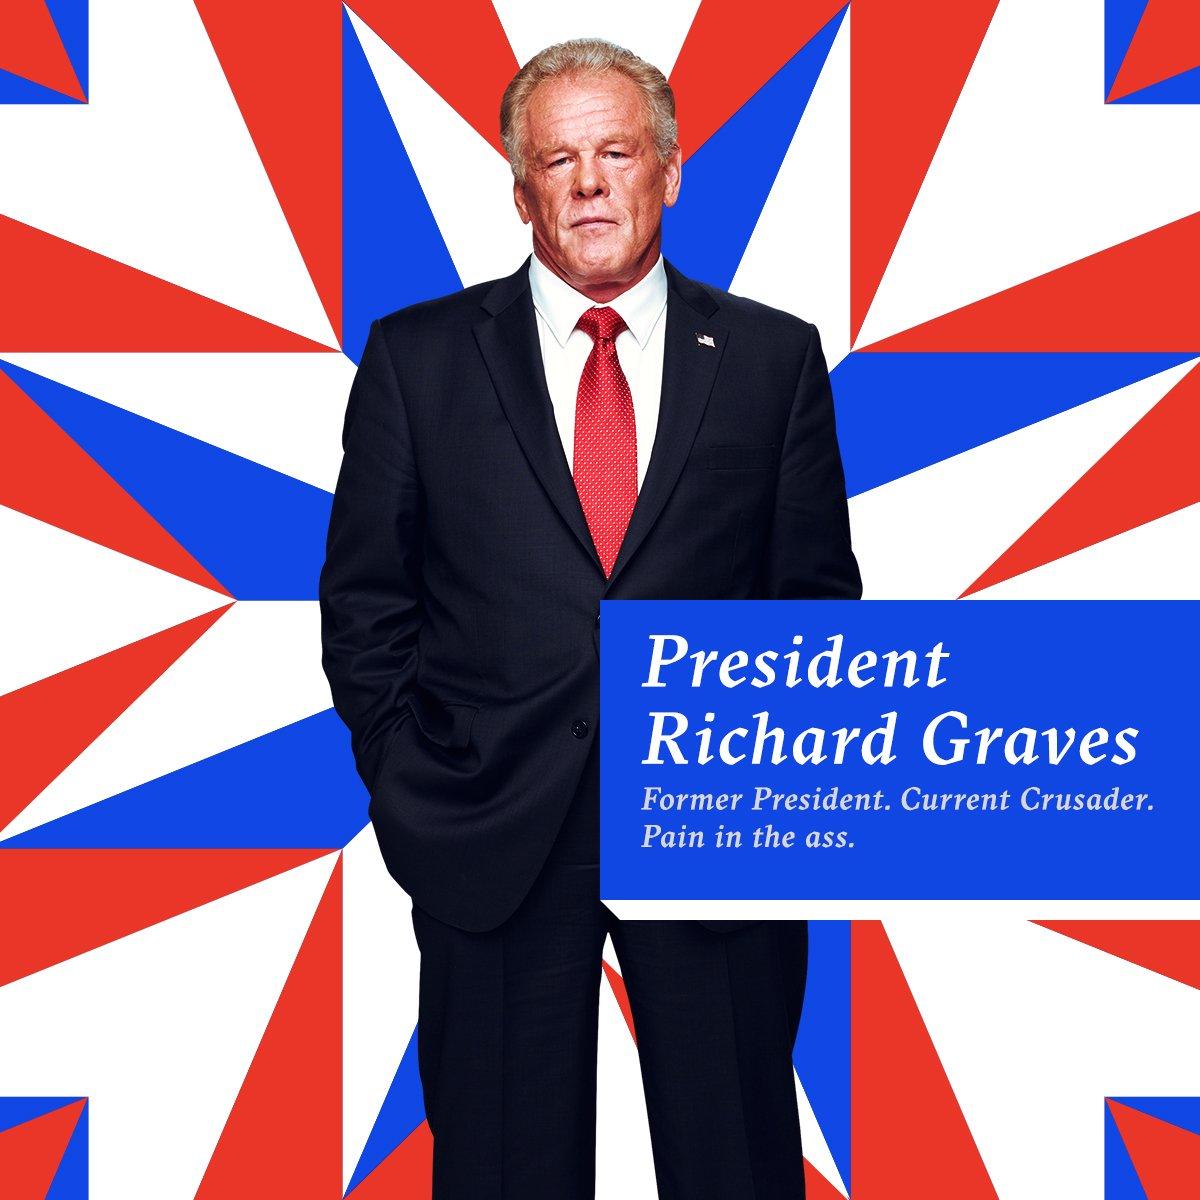 Richard Graves nick nolte